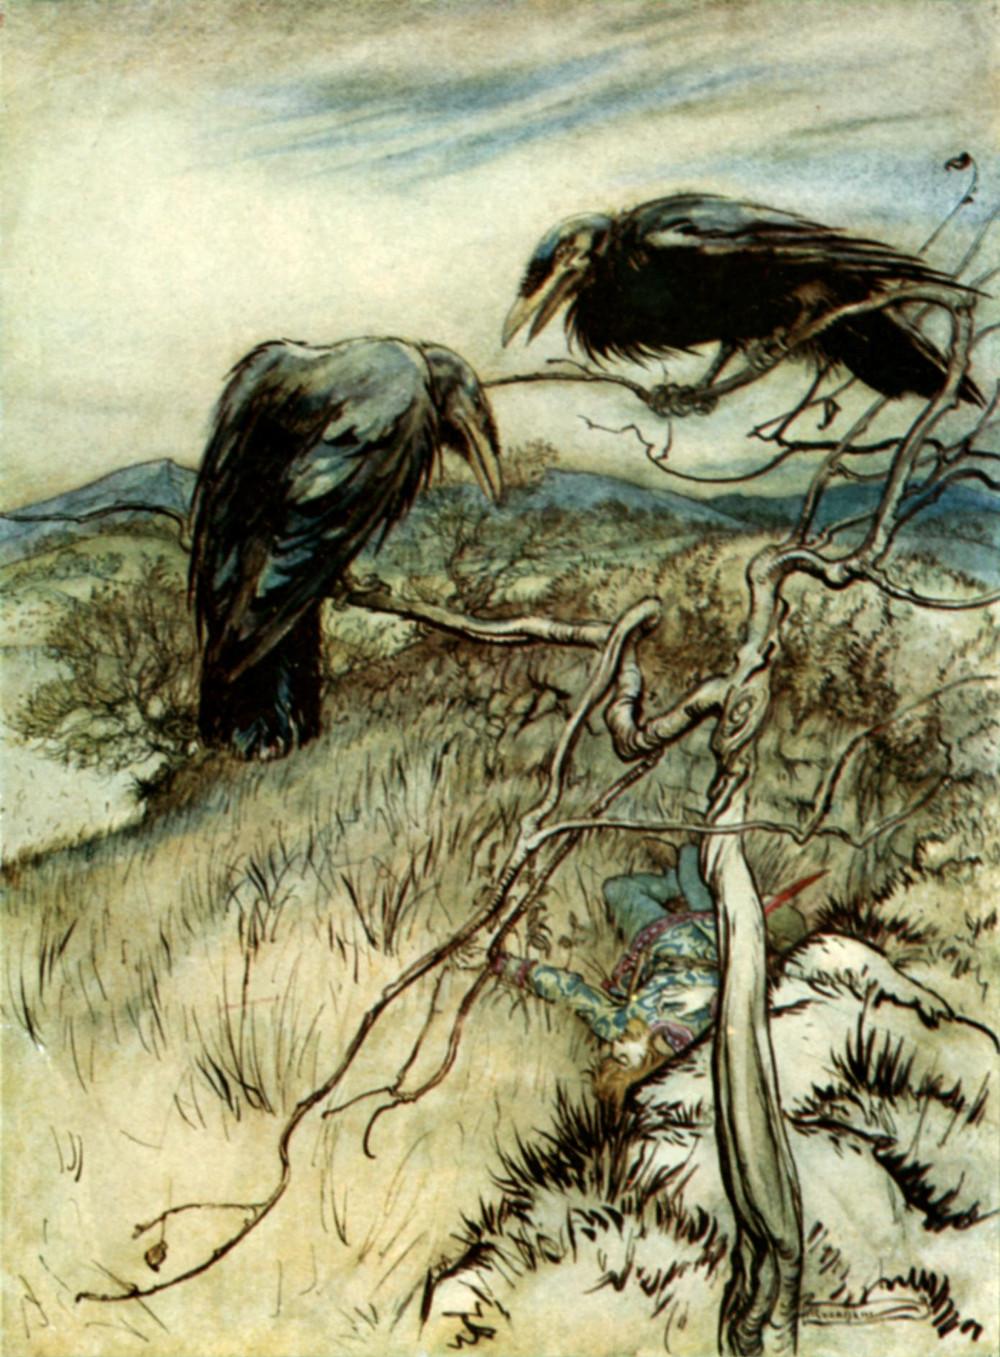 The Twa Corbies, illustration by Arthur Rackham